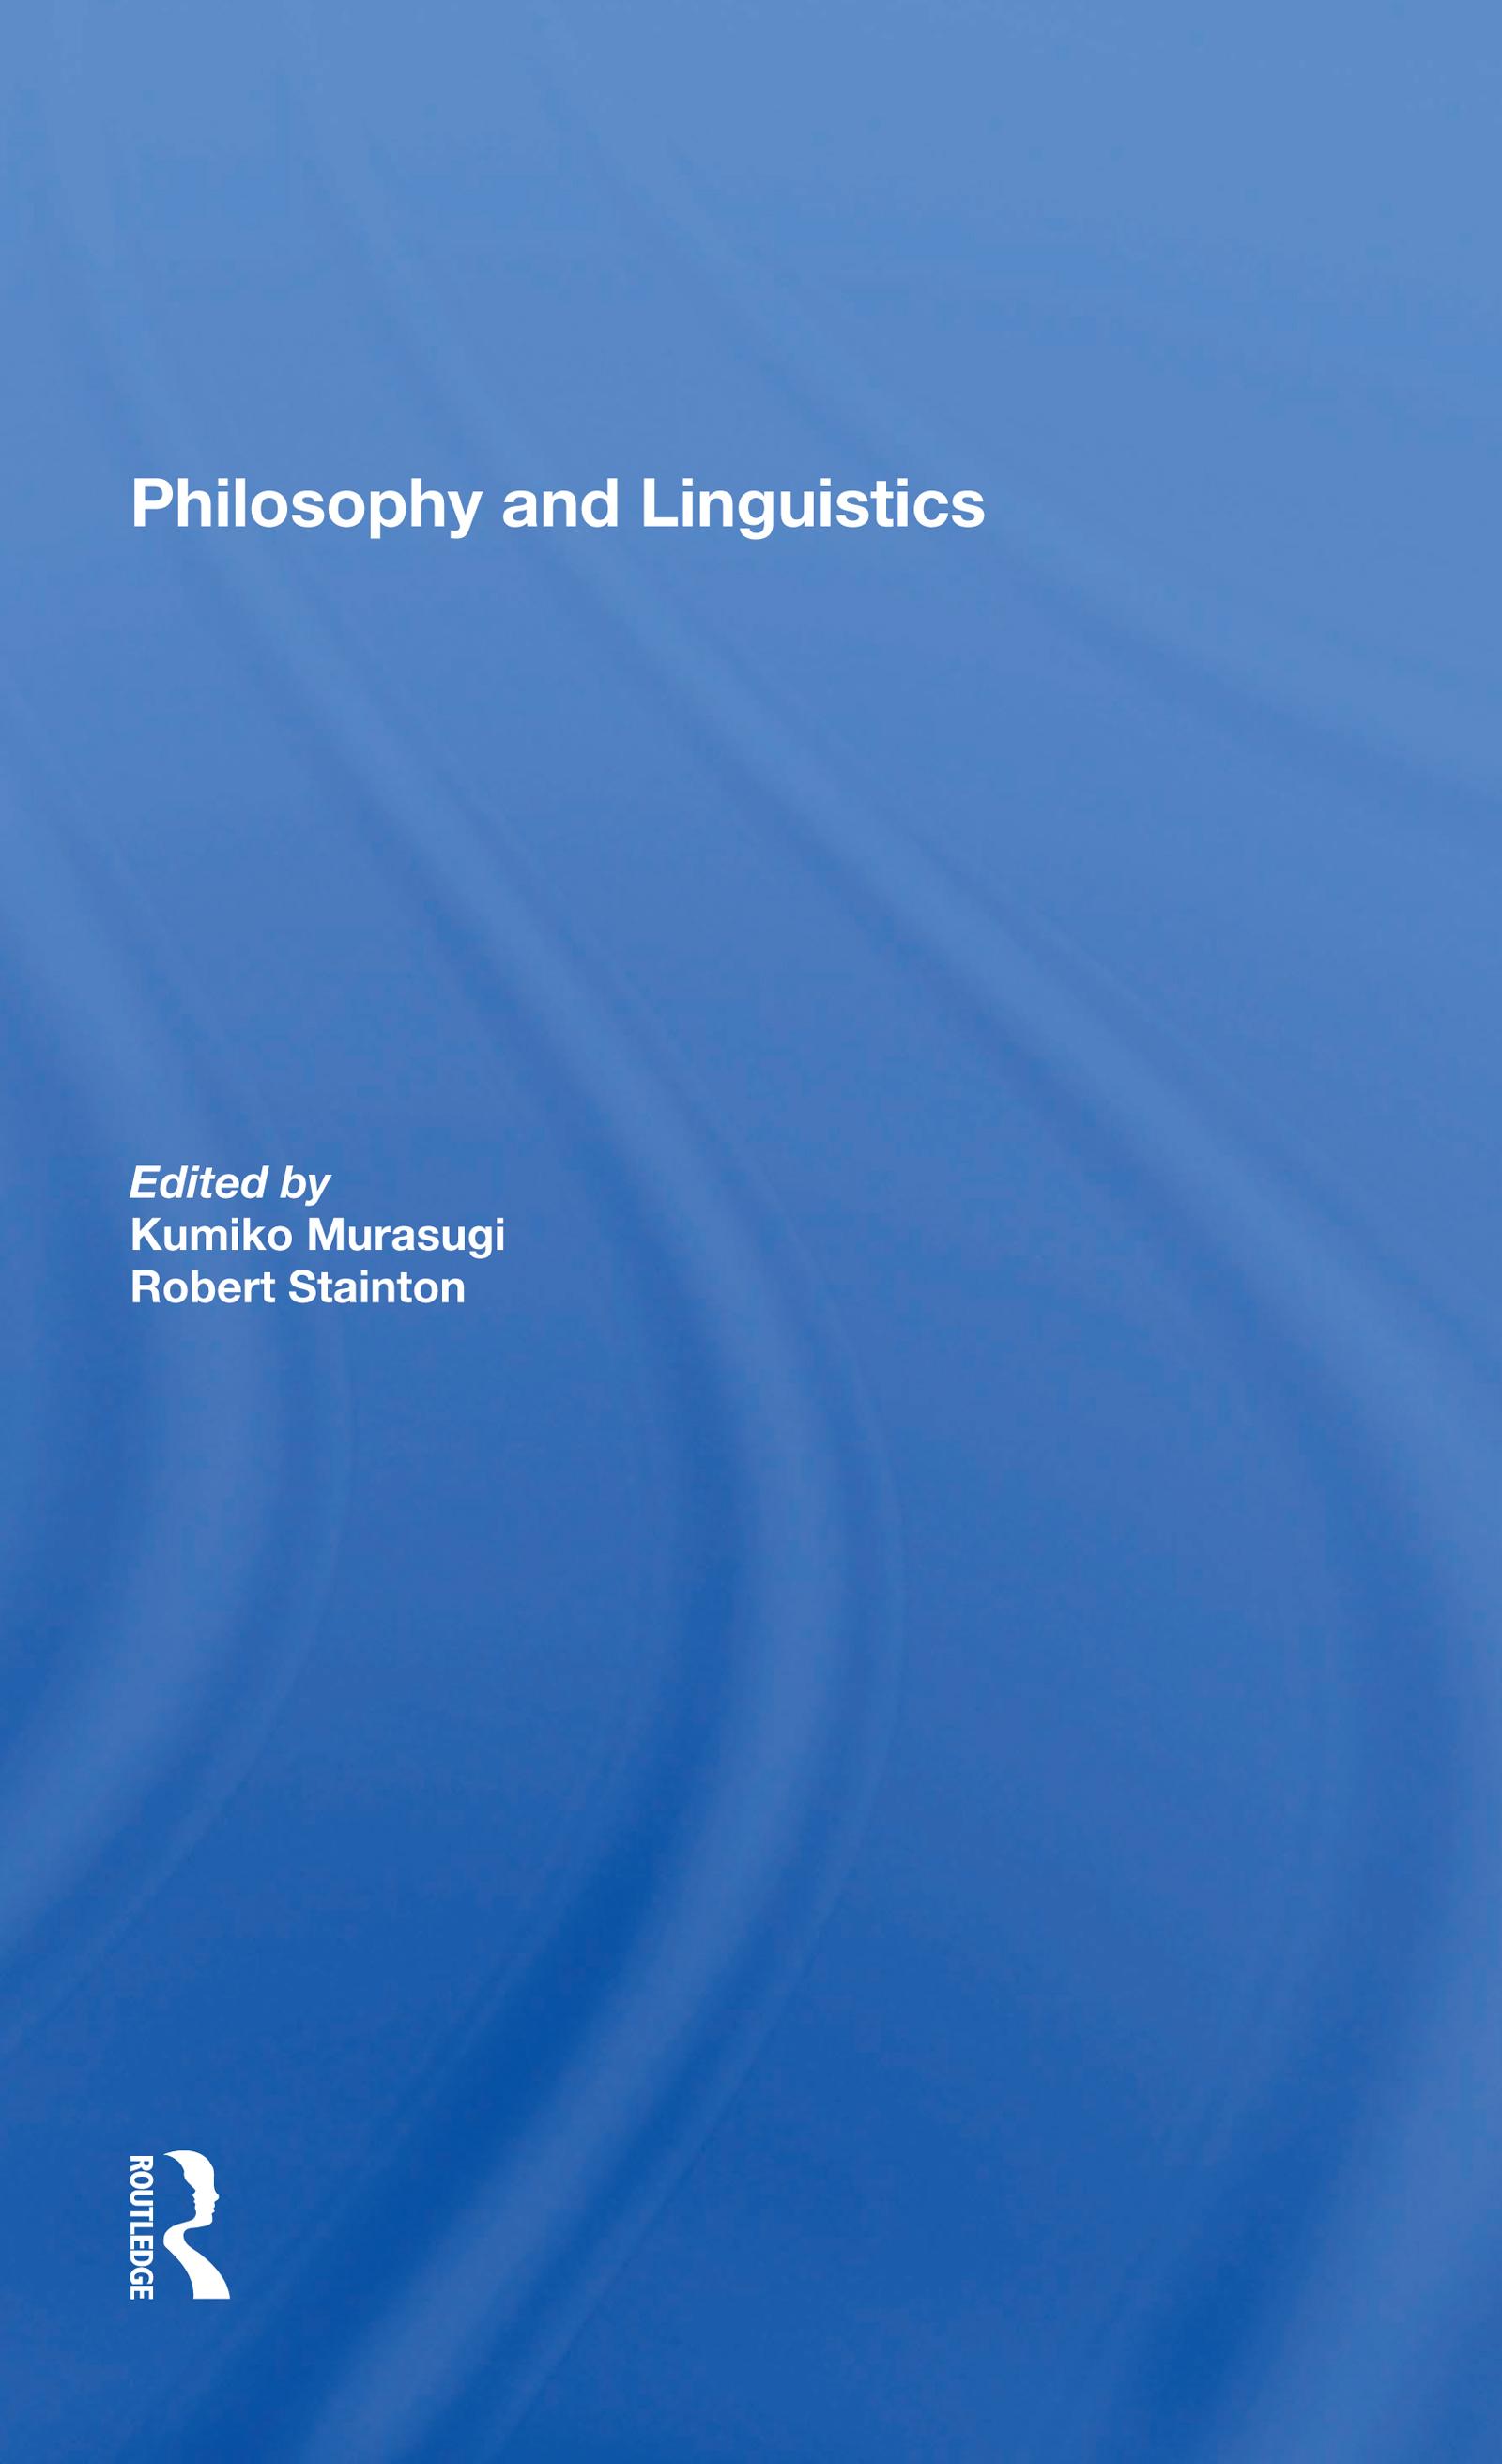 Philosophy and Linguistics